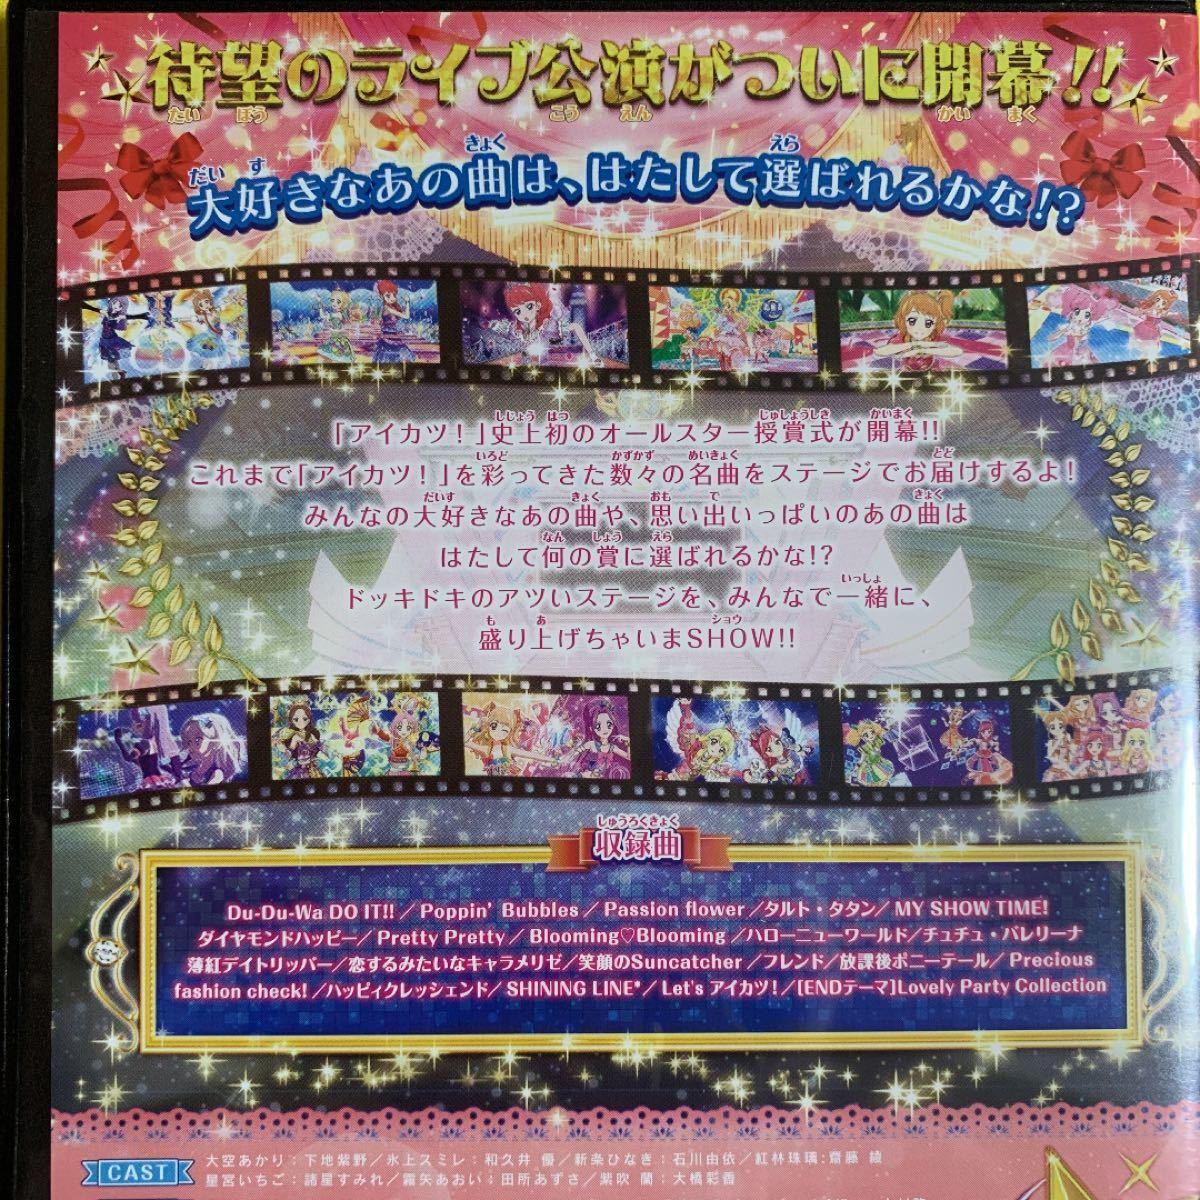 DVD 劇場版 アイカツ! 2巻セット レンタル落ち